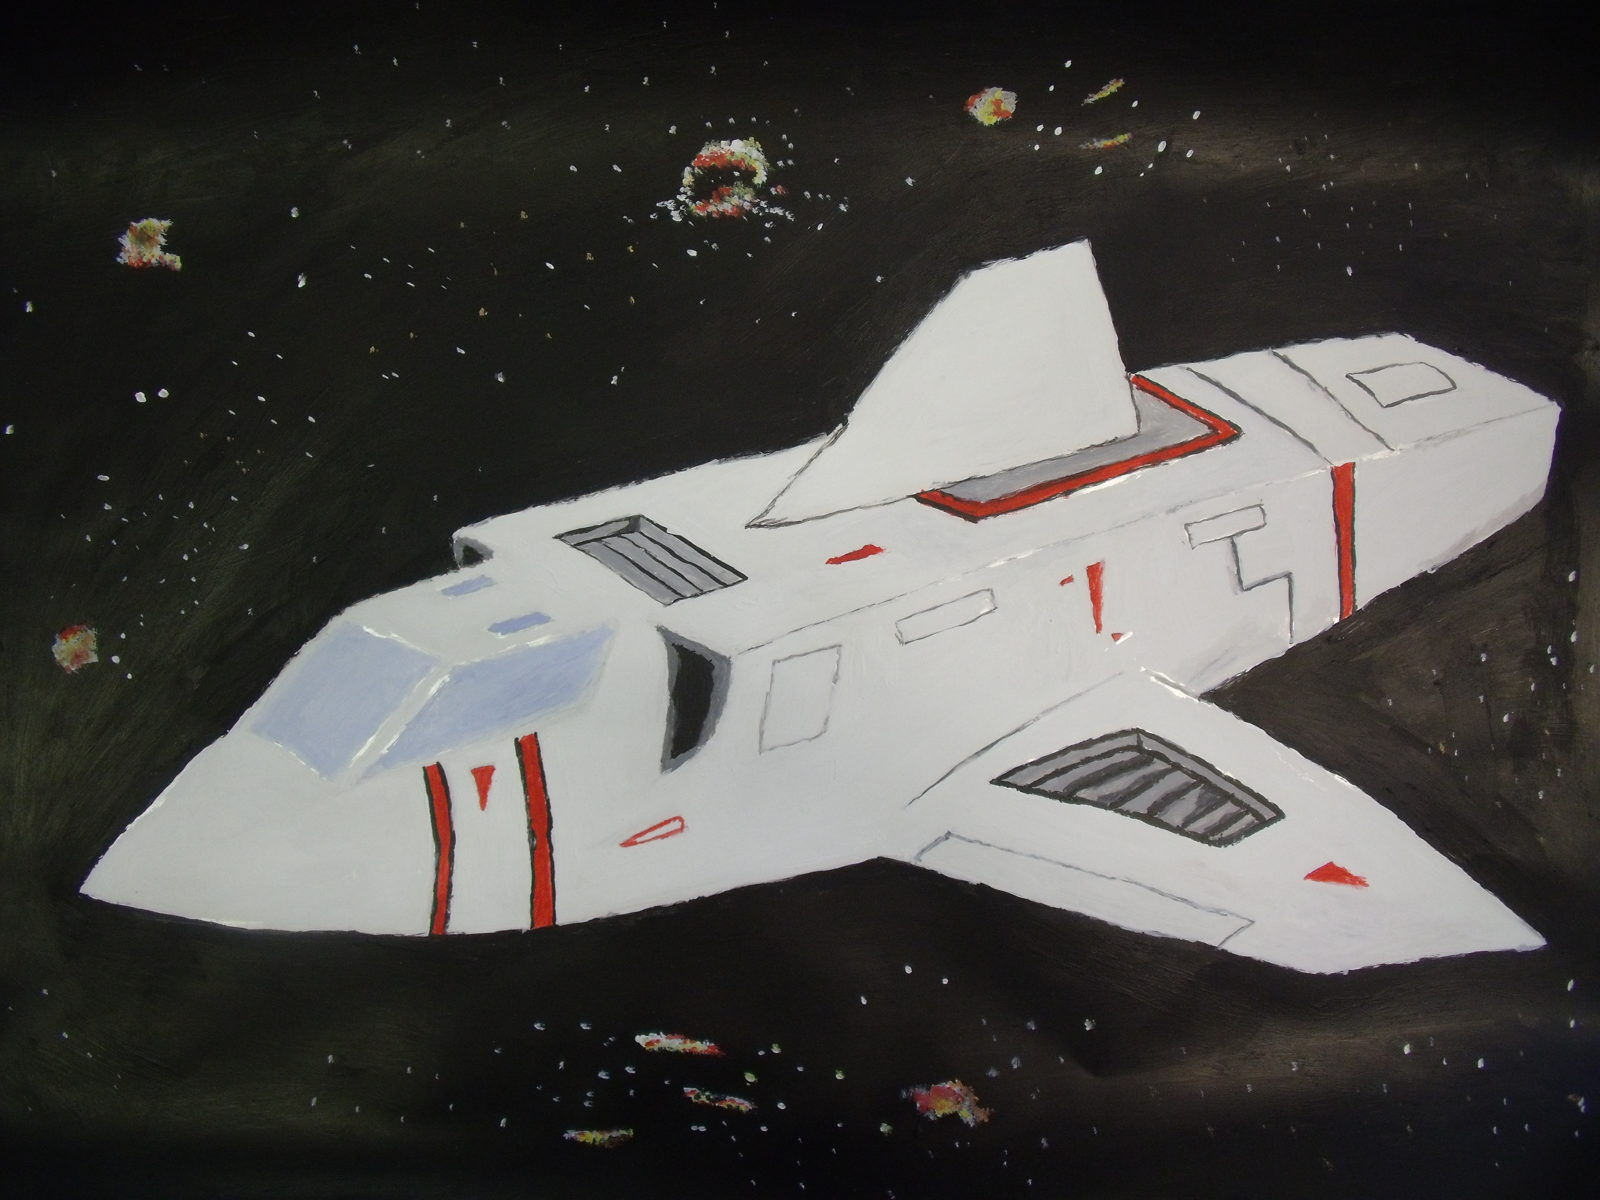 32516 || 3644 || Starfighter